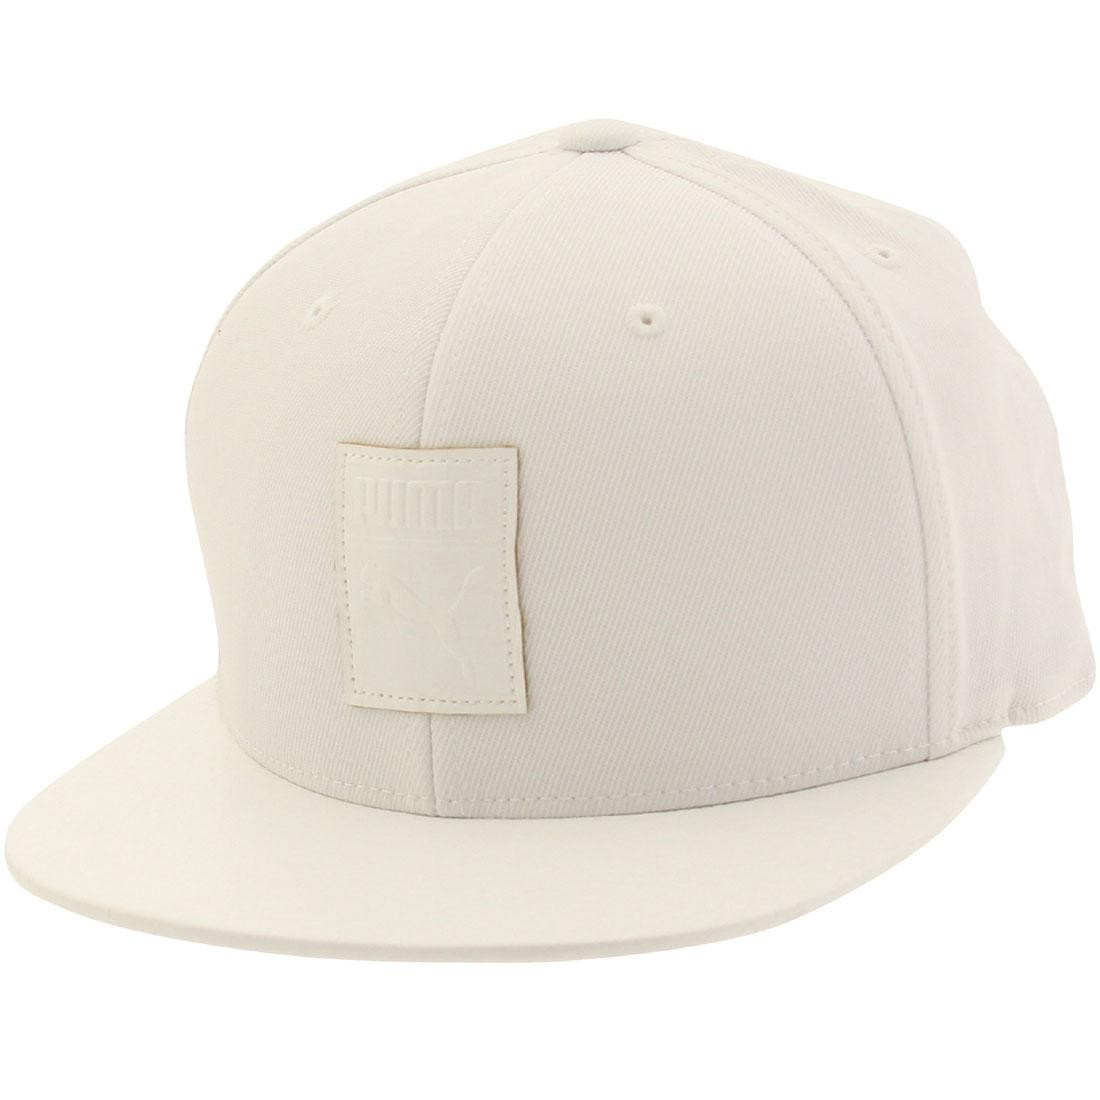 9aca073fb46 Puma Tactile 110 Snapback Cap white